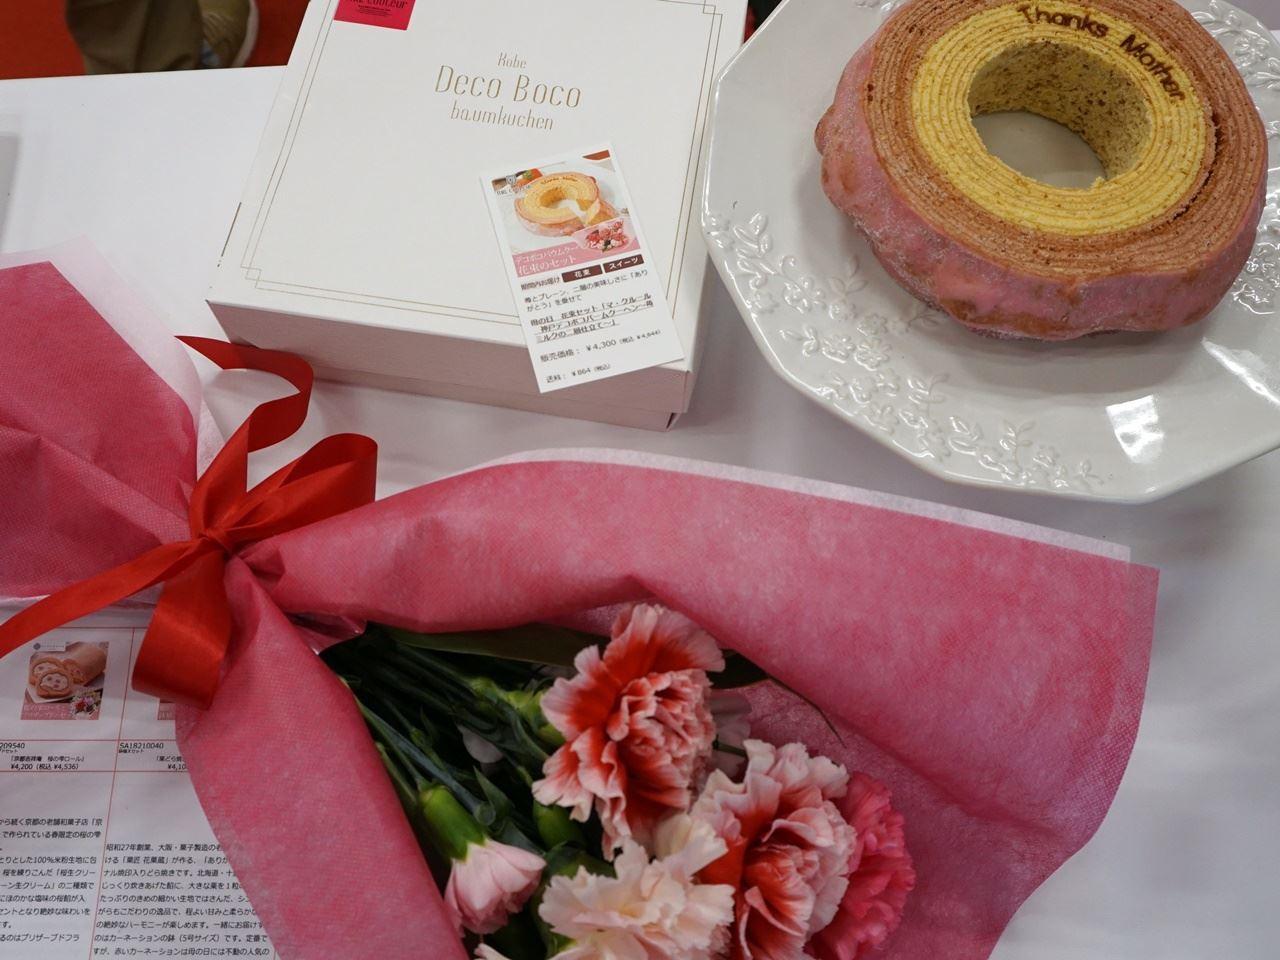 【e87】母の日 花束セット「マ・クルール 神戸デコボコバームクーヘン 苺ミルクの二層仕立て」